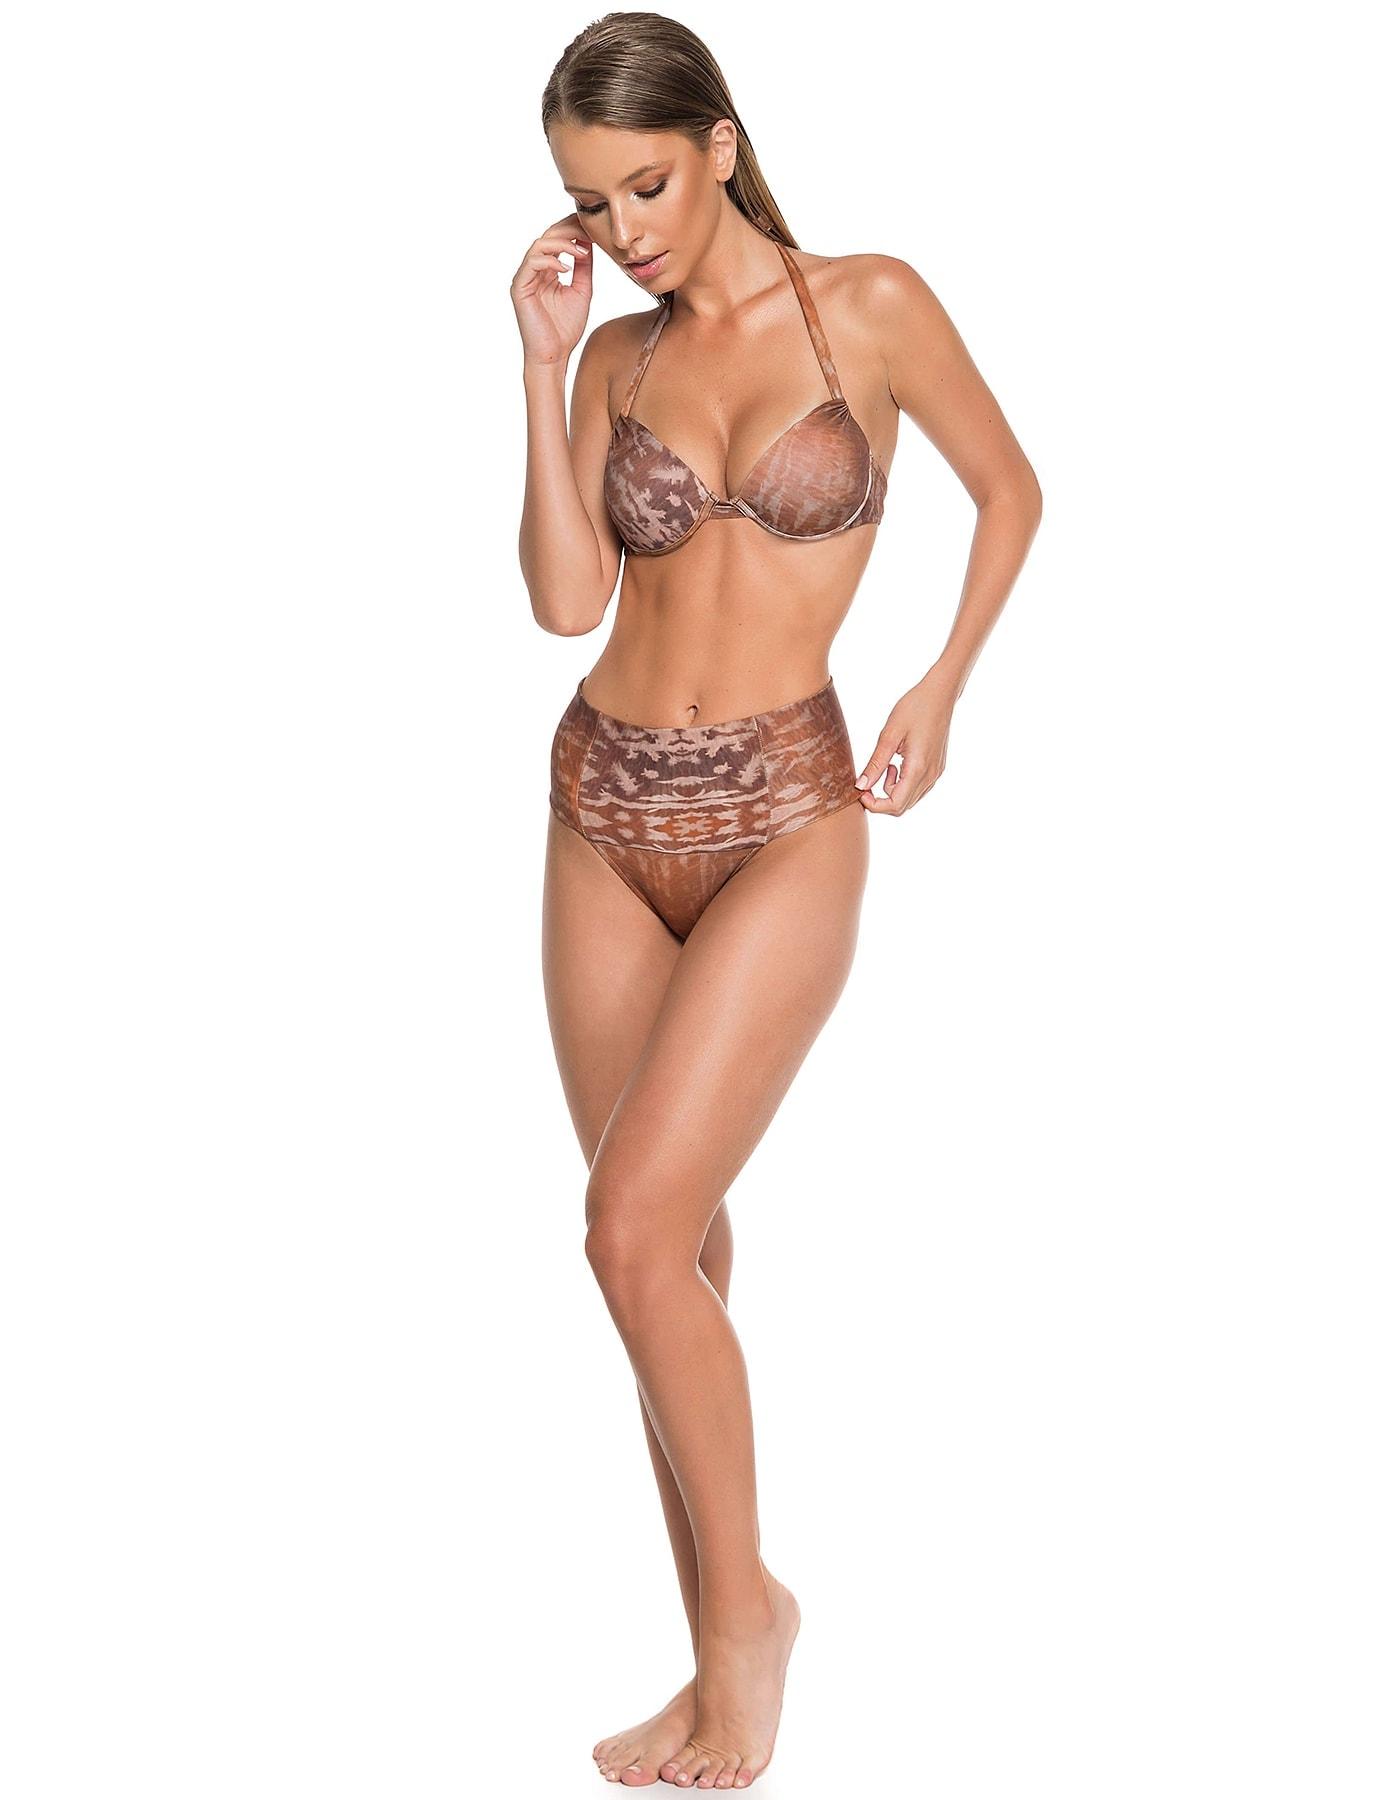 Bikini marrón, escote balconette + Braguita Bikini marrón con drapeado alto | Camel E